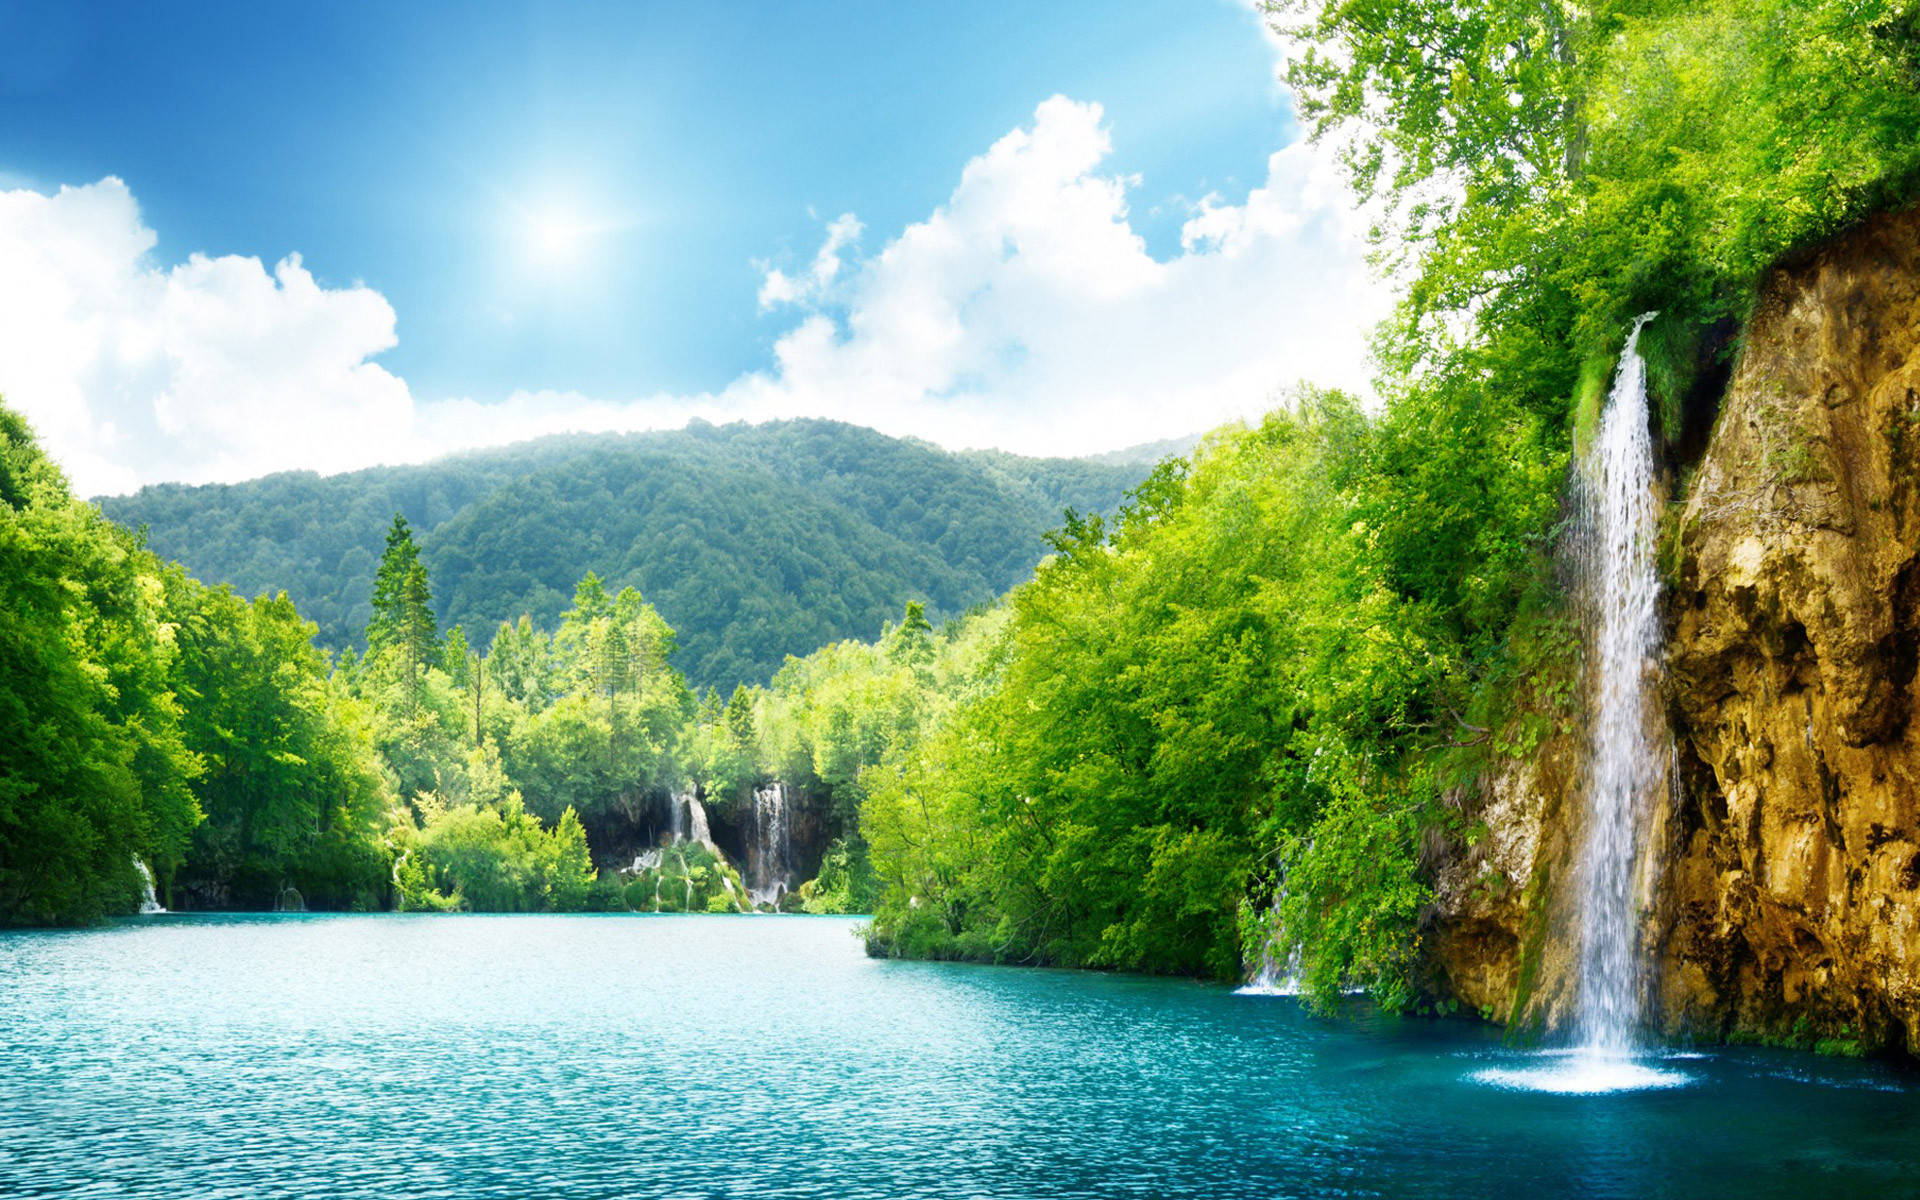 HD Landscape Nature Wallpapers: Find best latest HD Landscape Nature  Wallpapers in HD for your